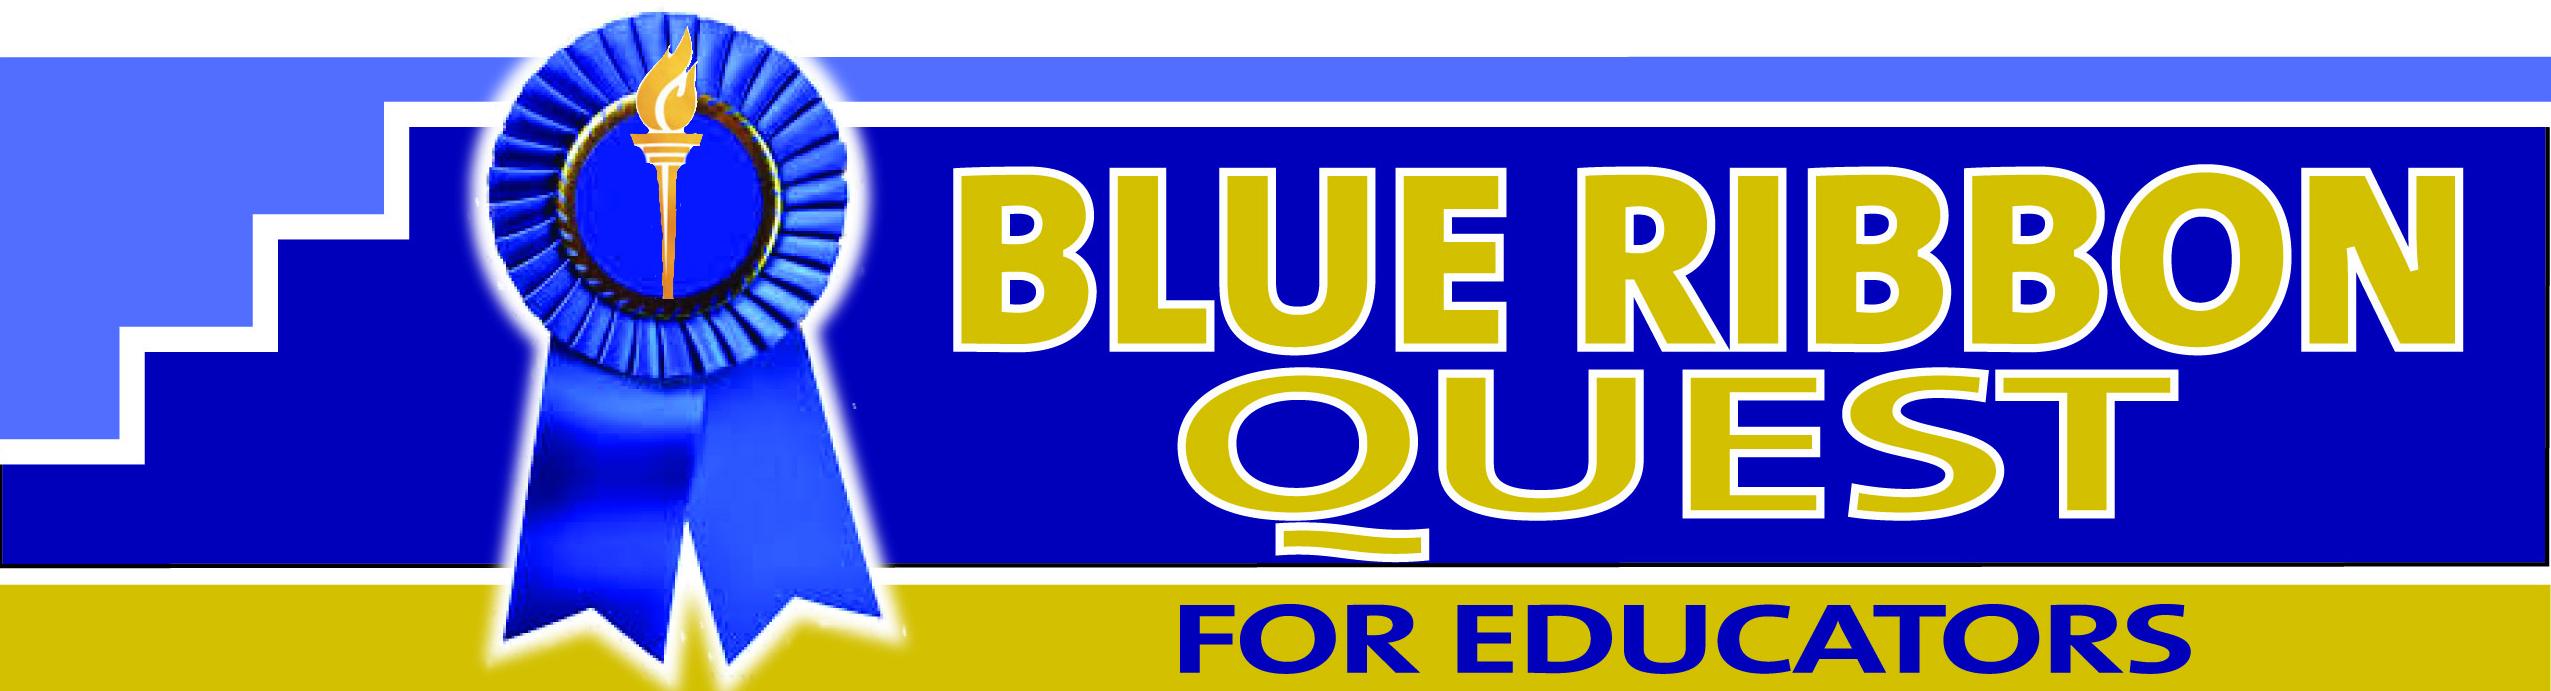 Blue Ribbon 001 Logo Outlined Blued